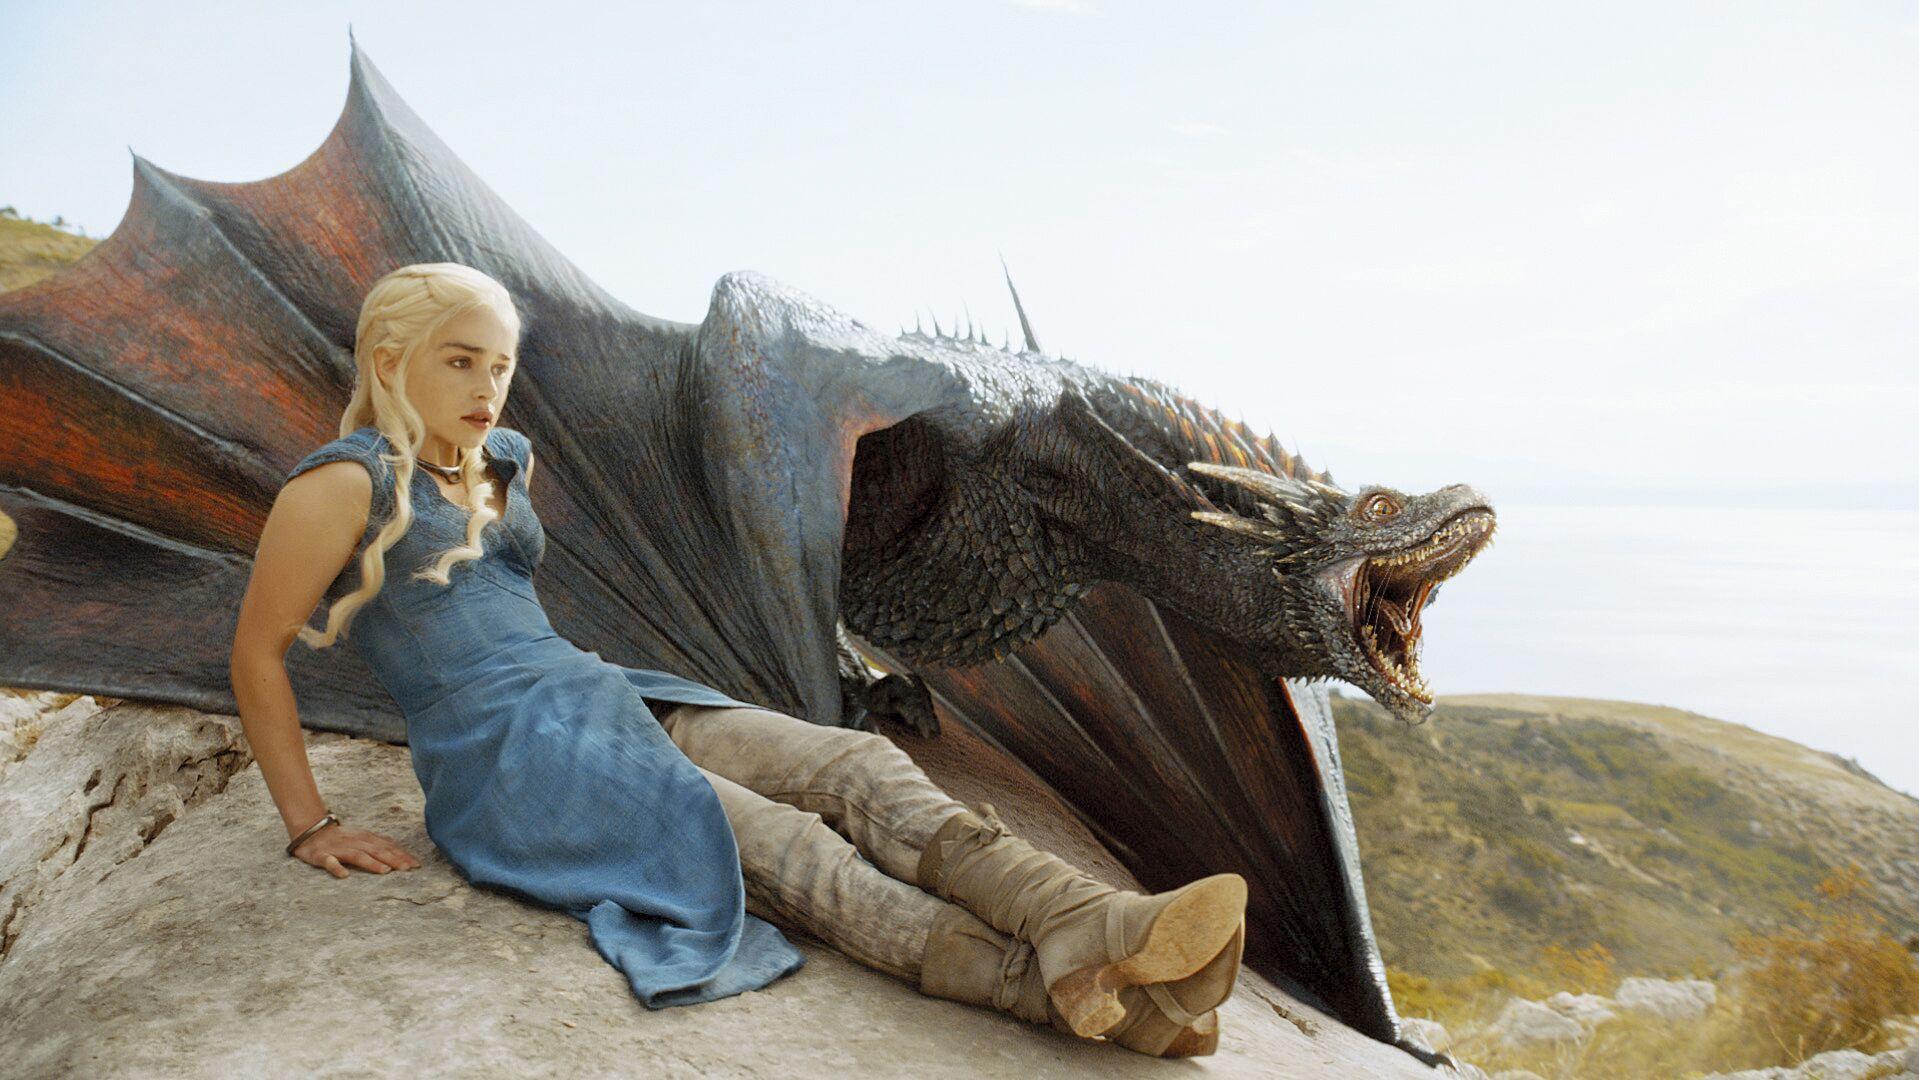 Fire & Blood' will reveal the origin of Daenerys' dragon eggs